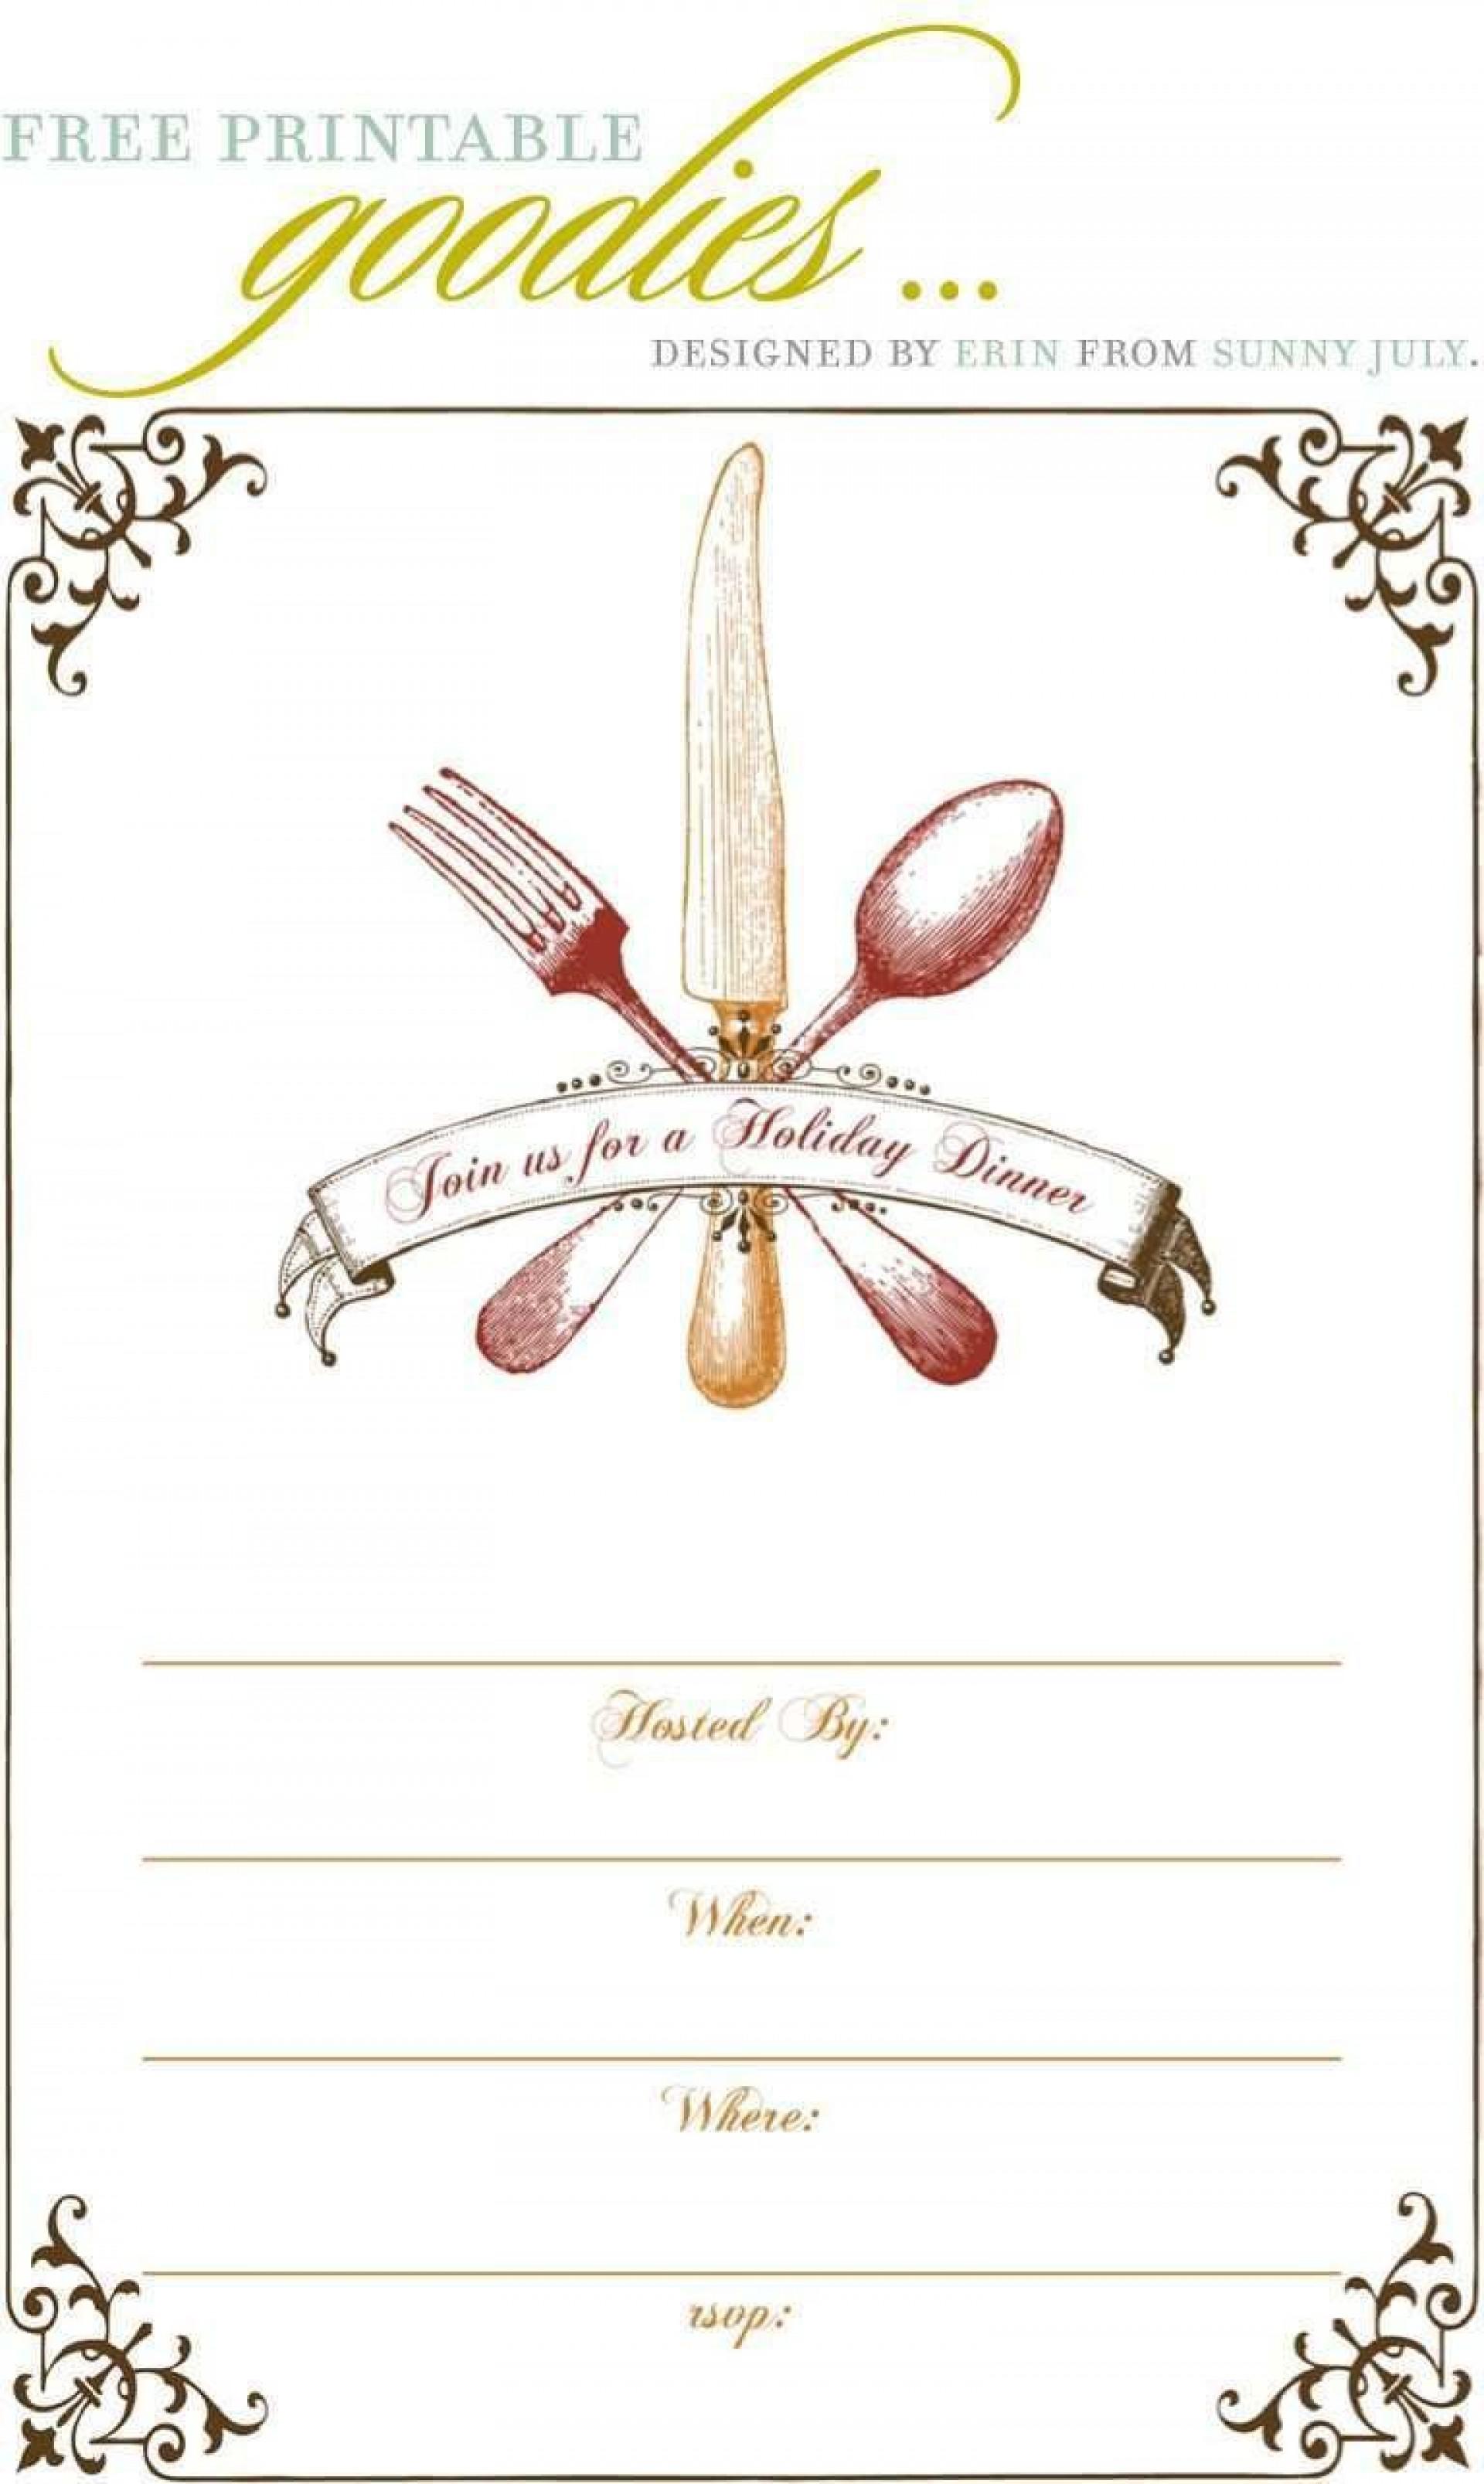 001 Unforgettable Free Dinner Invitation Template Design  Templates Rehearsal Printable Italian Thanksgiving1920